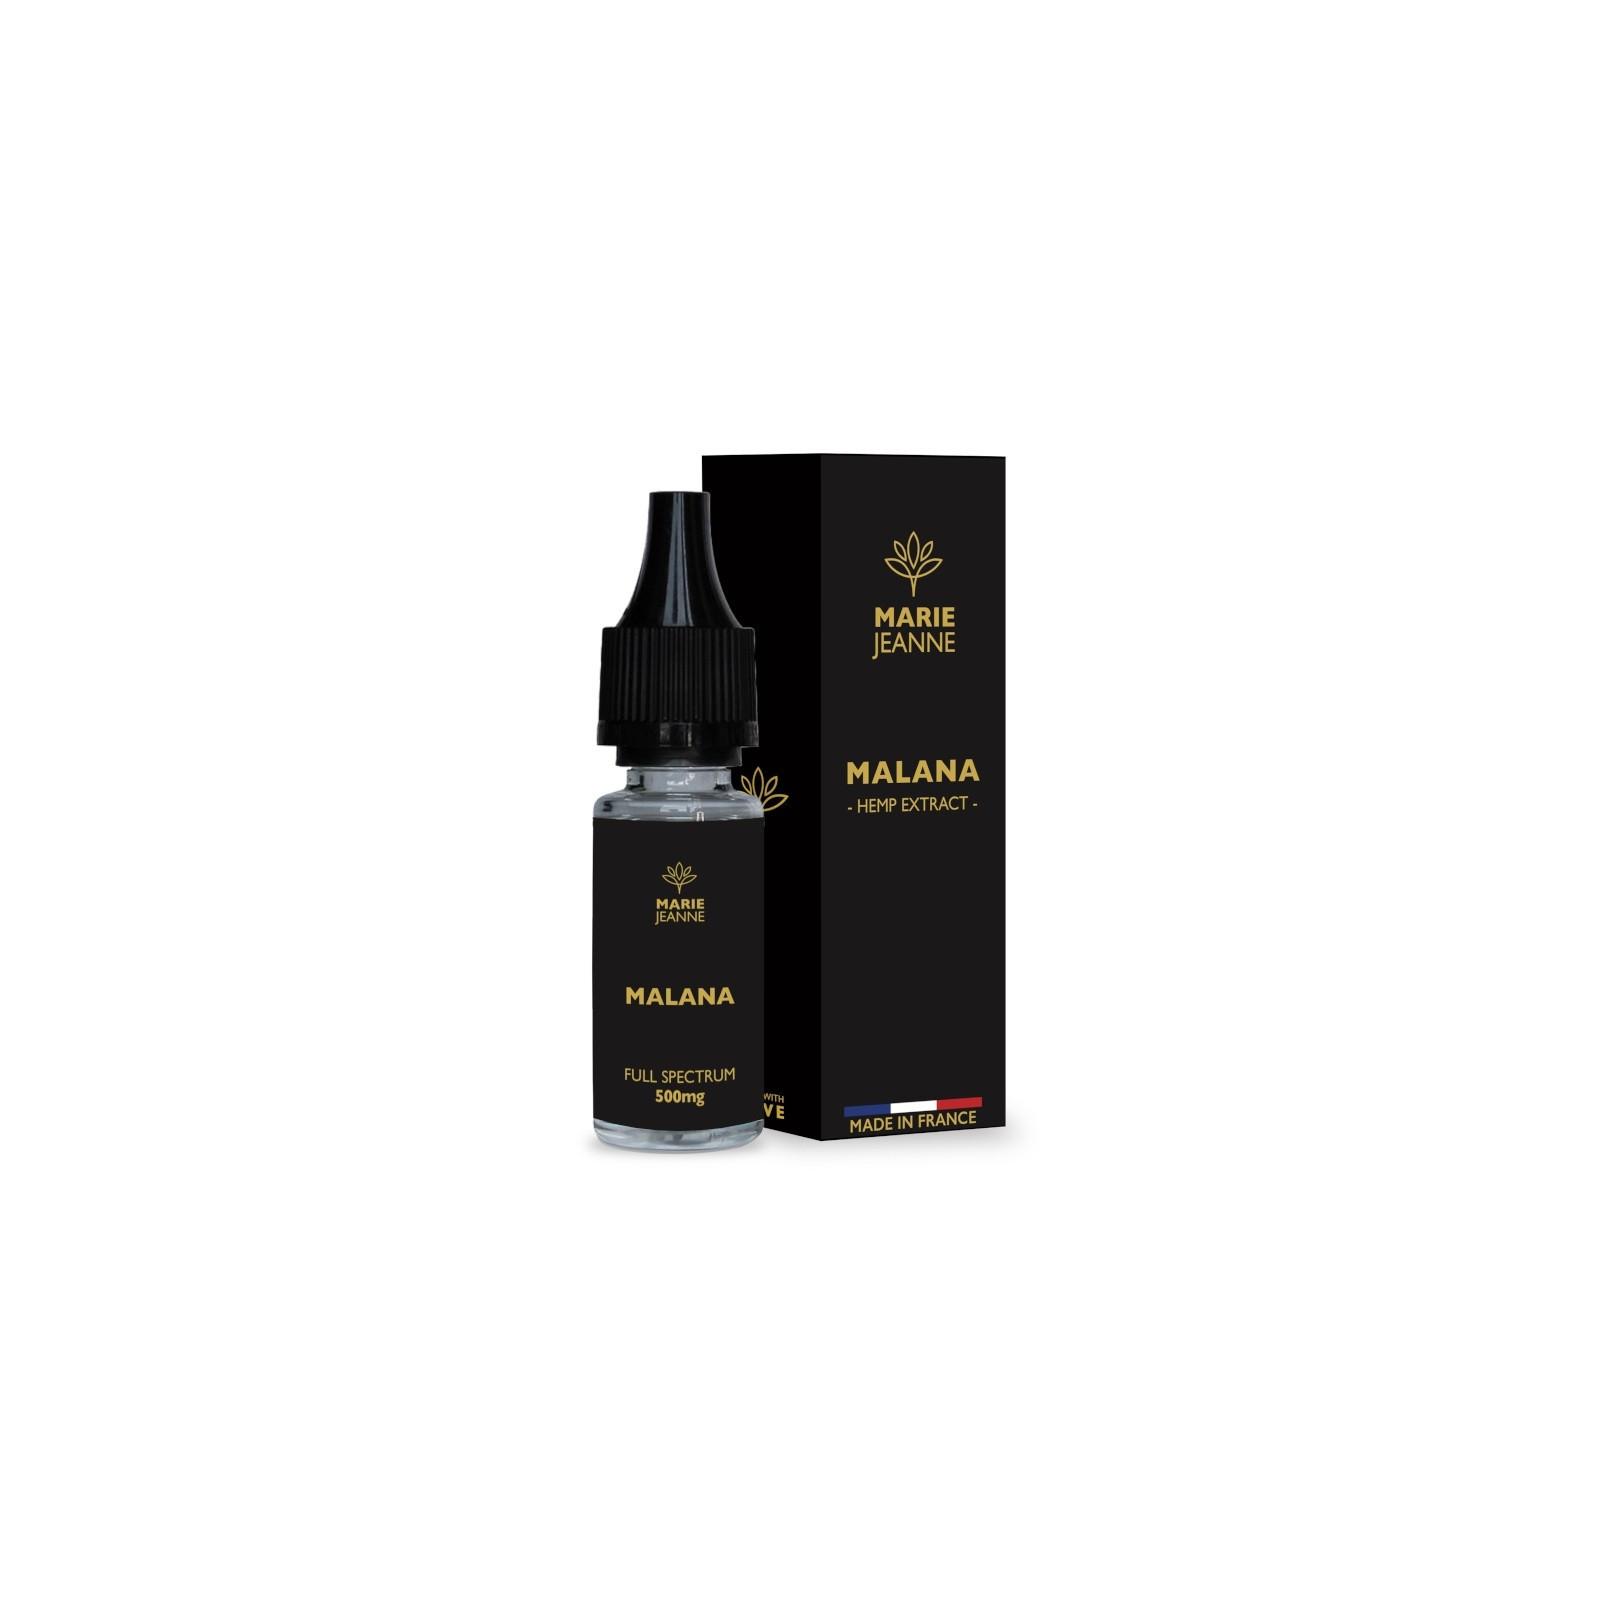 Malana Full Spectrum - Marie Jeanne